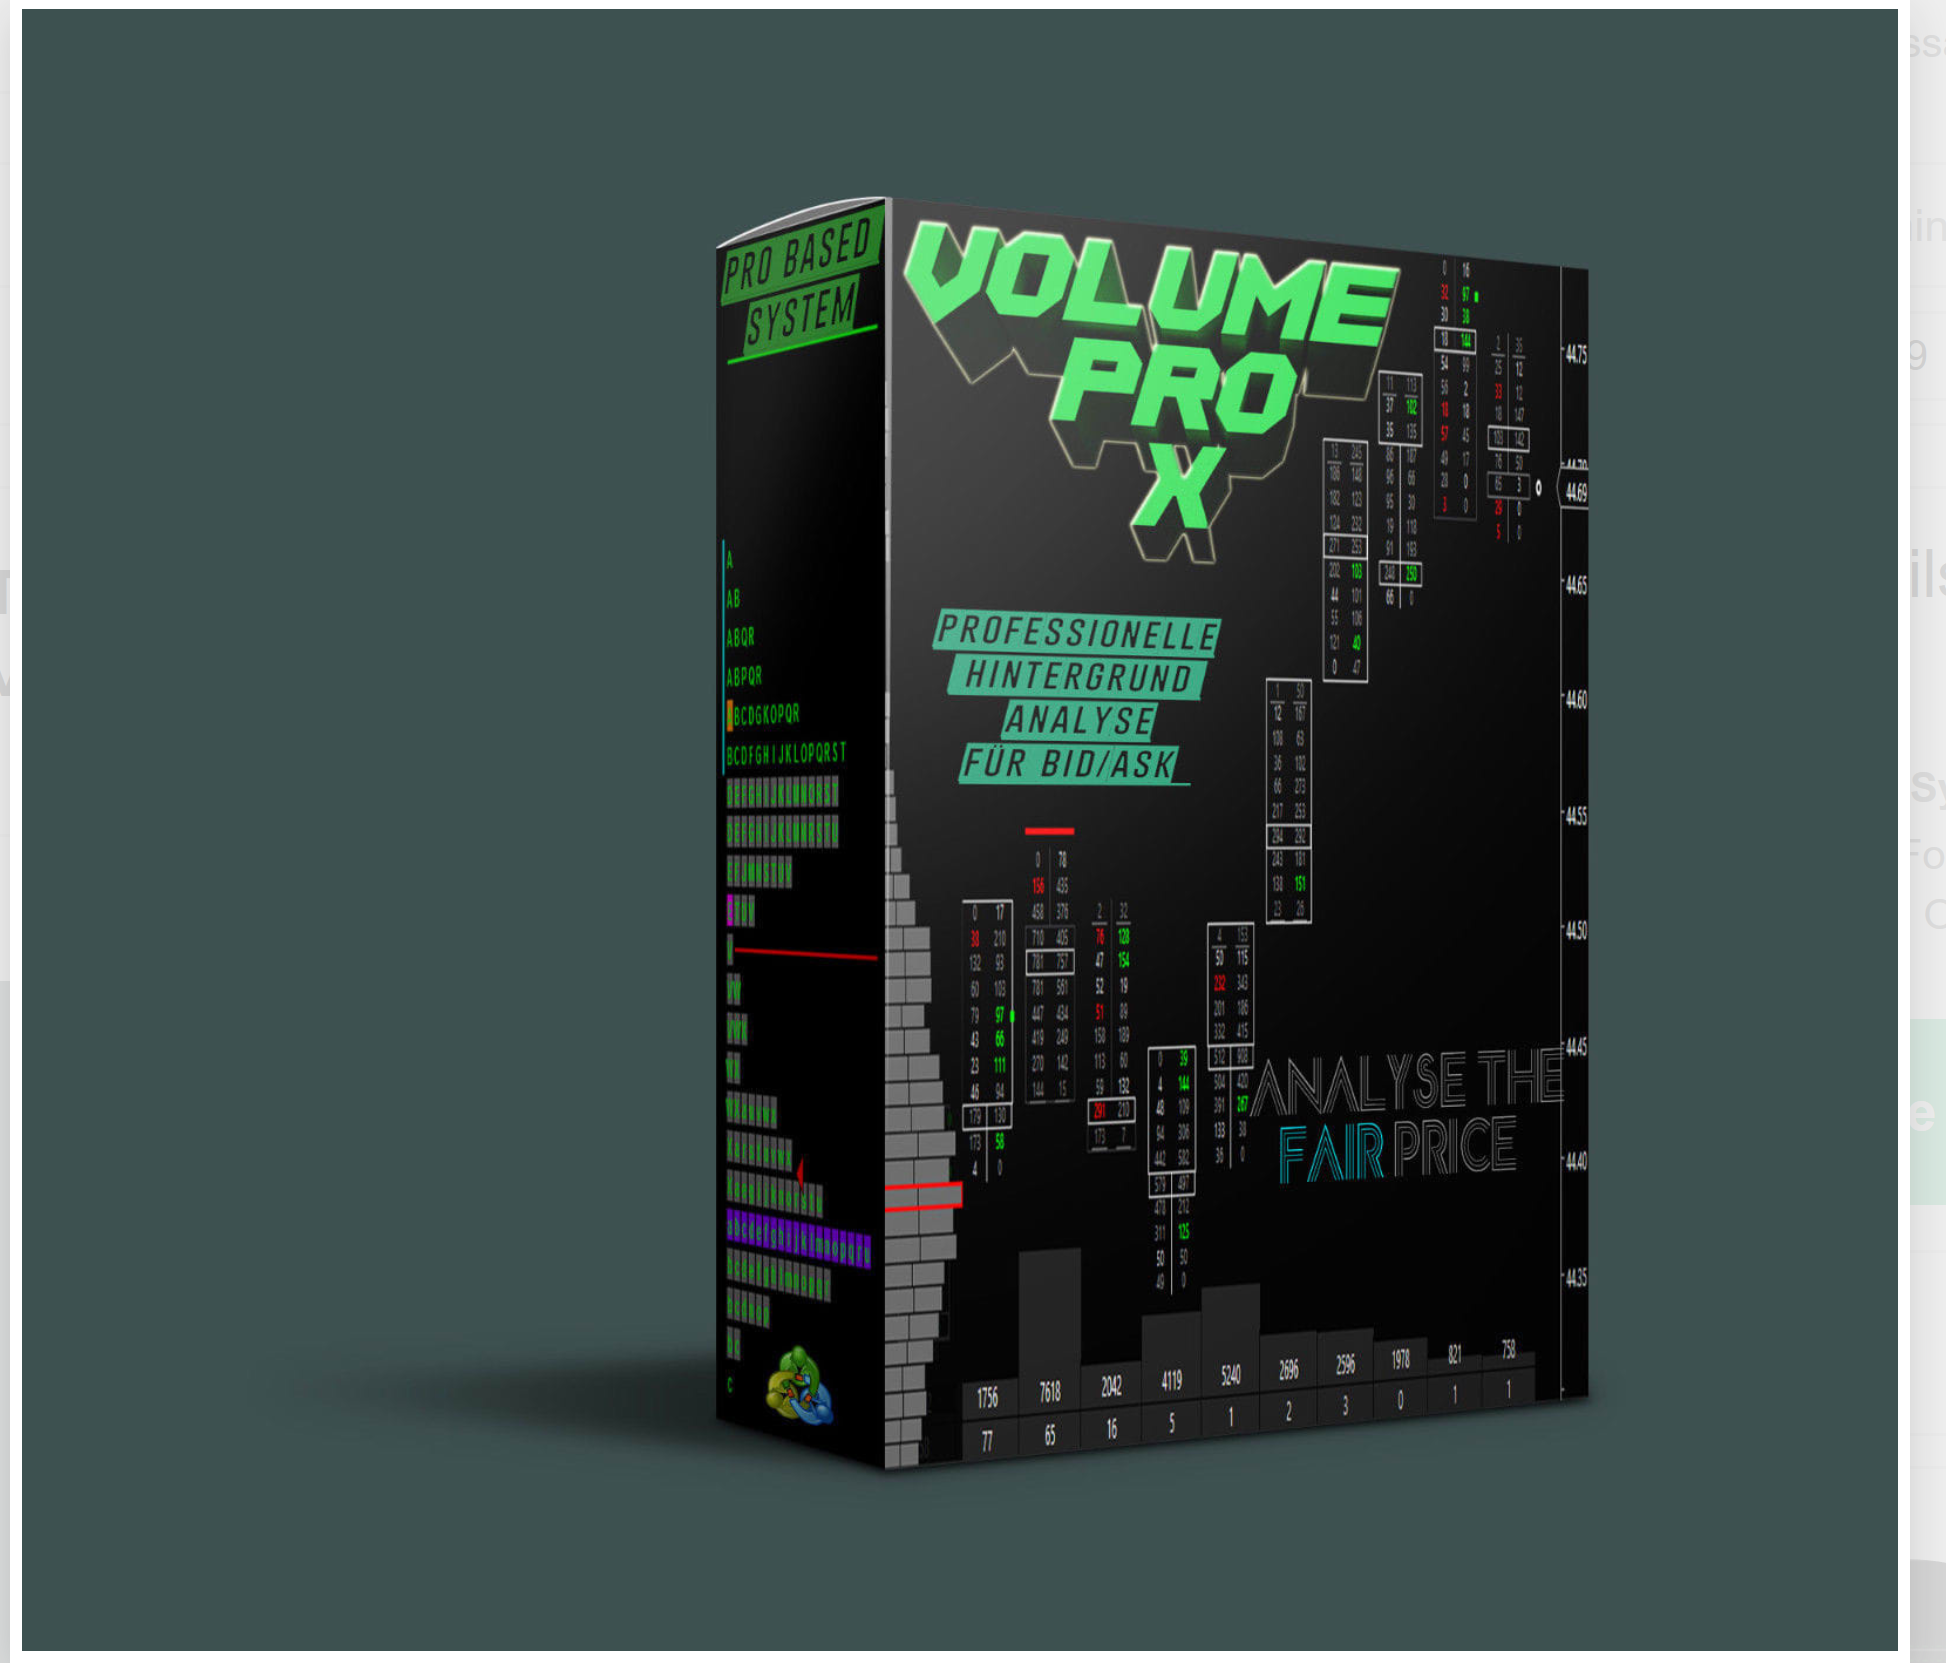 Volume Pro X Advanced System